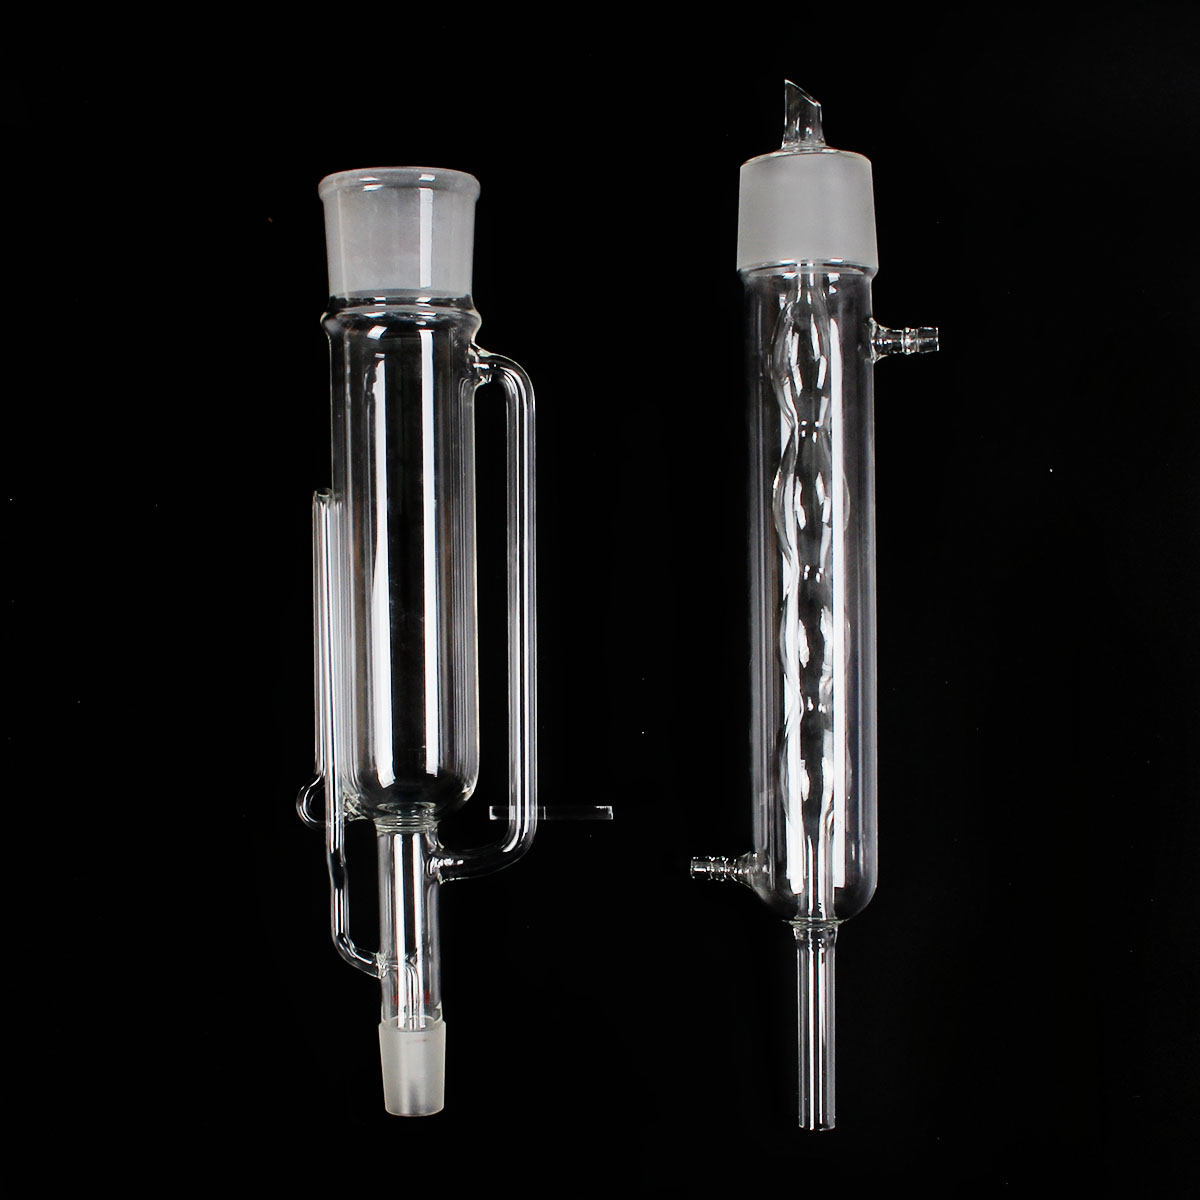 500ml 24/29 Glass Soxhlet Extractor Allihn Condenser Body Glassware Kit Lab Glassware Set Supplies Transparent